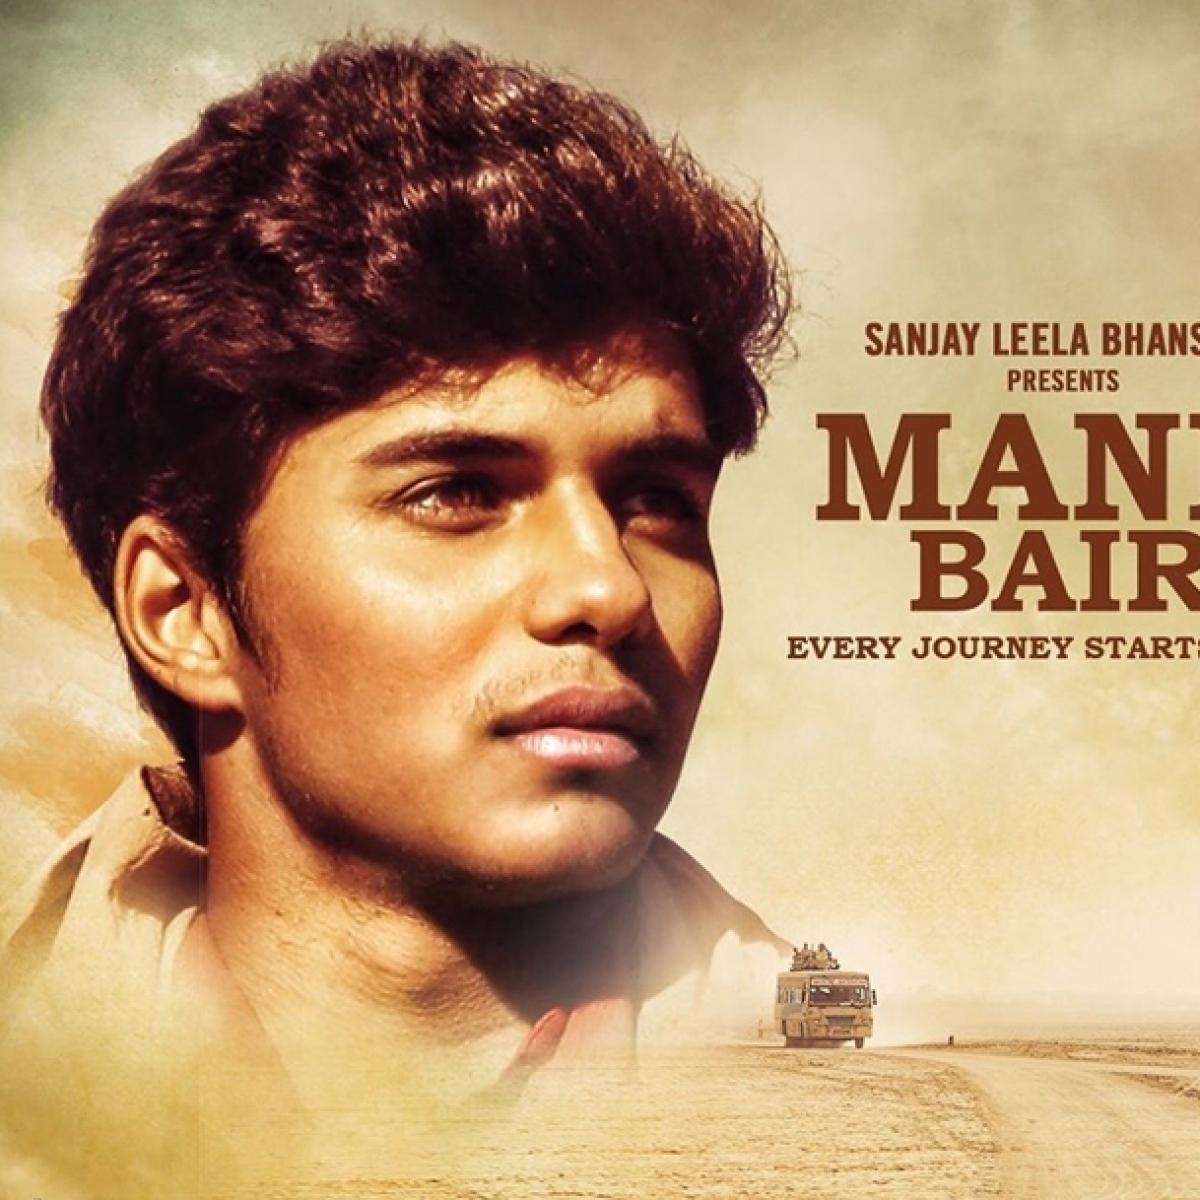 Prabhas unveils the first poster of movie 'Mann Bairagi' based on PM Narendra Modi